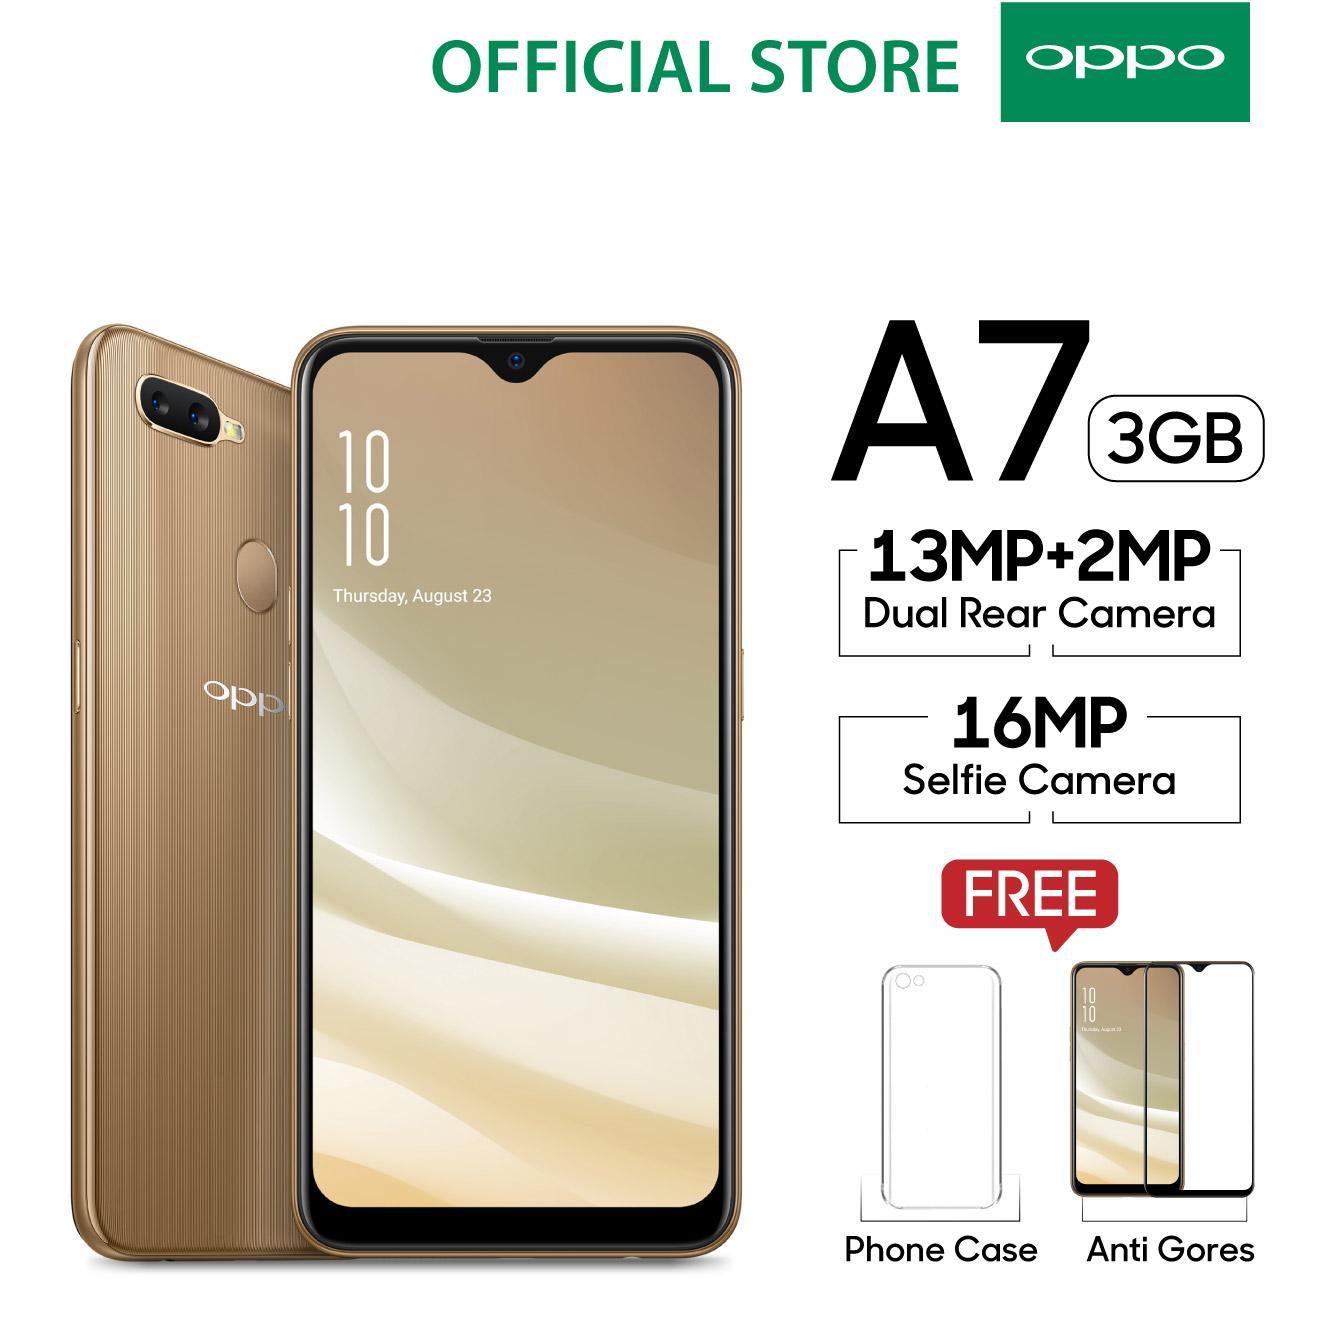 OPPO A7 SMARTPHONE 3GB/64GB,Waterdrop Screen, 3D Premium Body,Dual Camera, AI beauty, Long Lasting Battery (Garansi Resmi, Cicilan 0%, Gratis Ongkir)